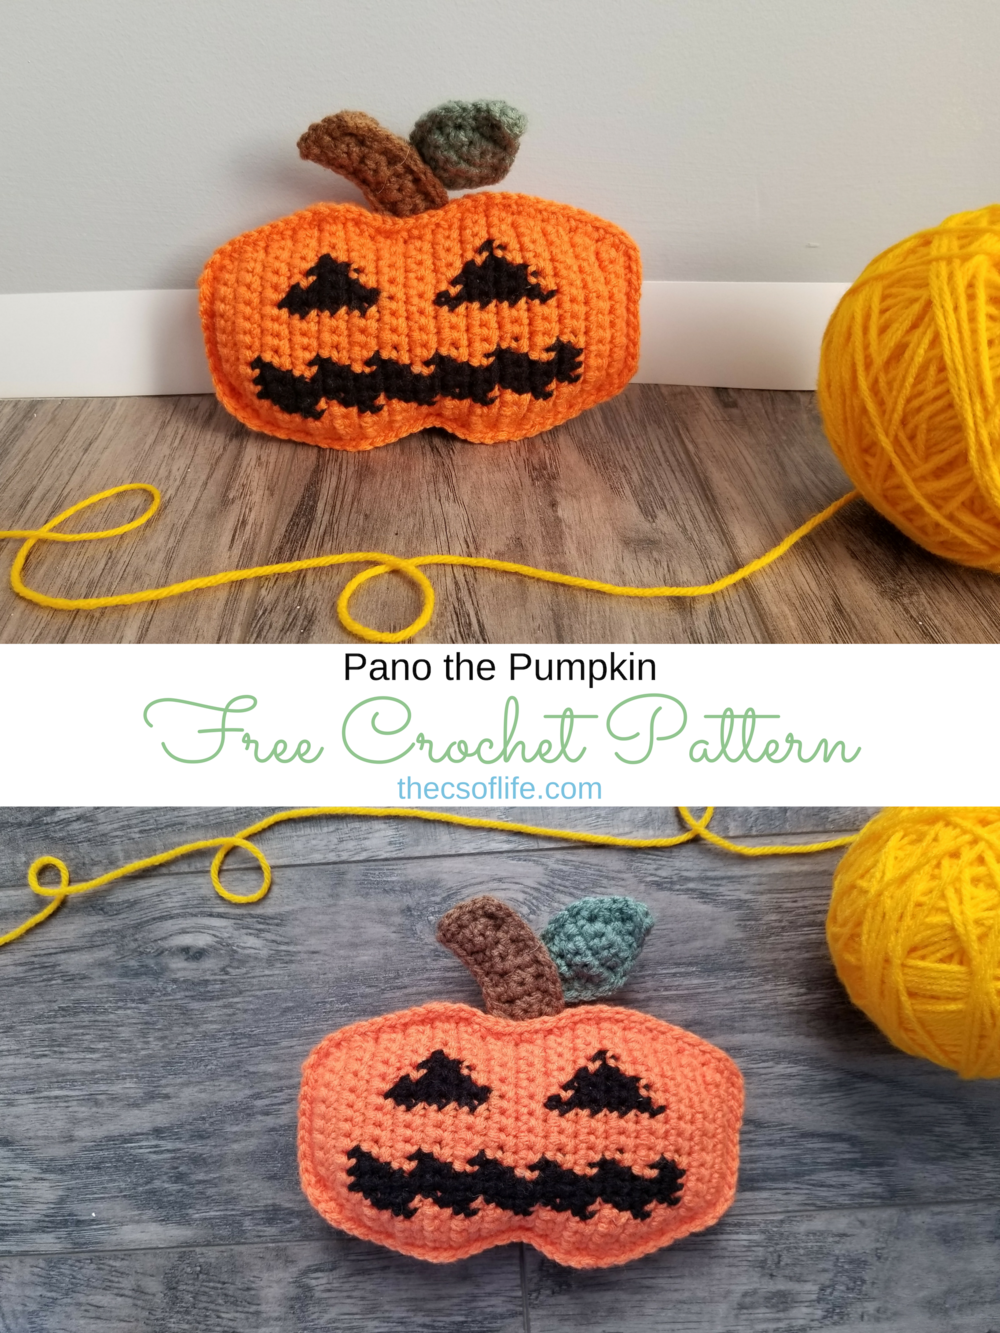 Pano the Pumpkin - Free Crochet Pattern